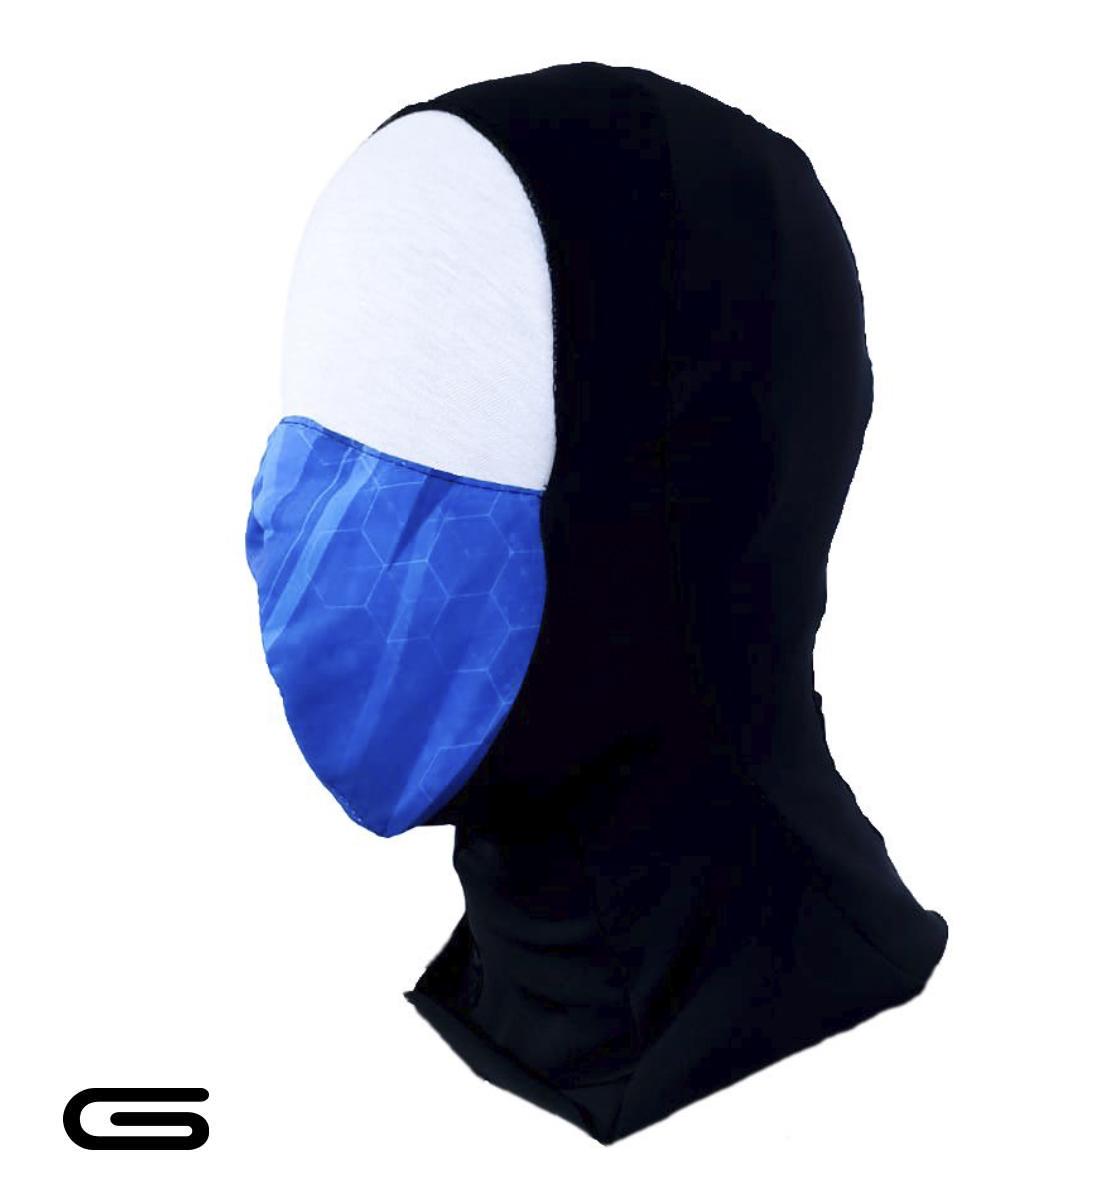 Pro Face mask